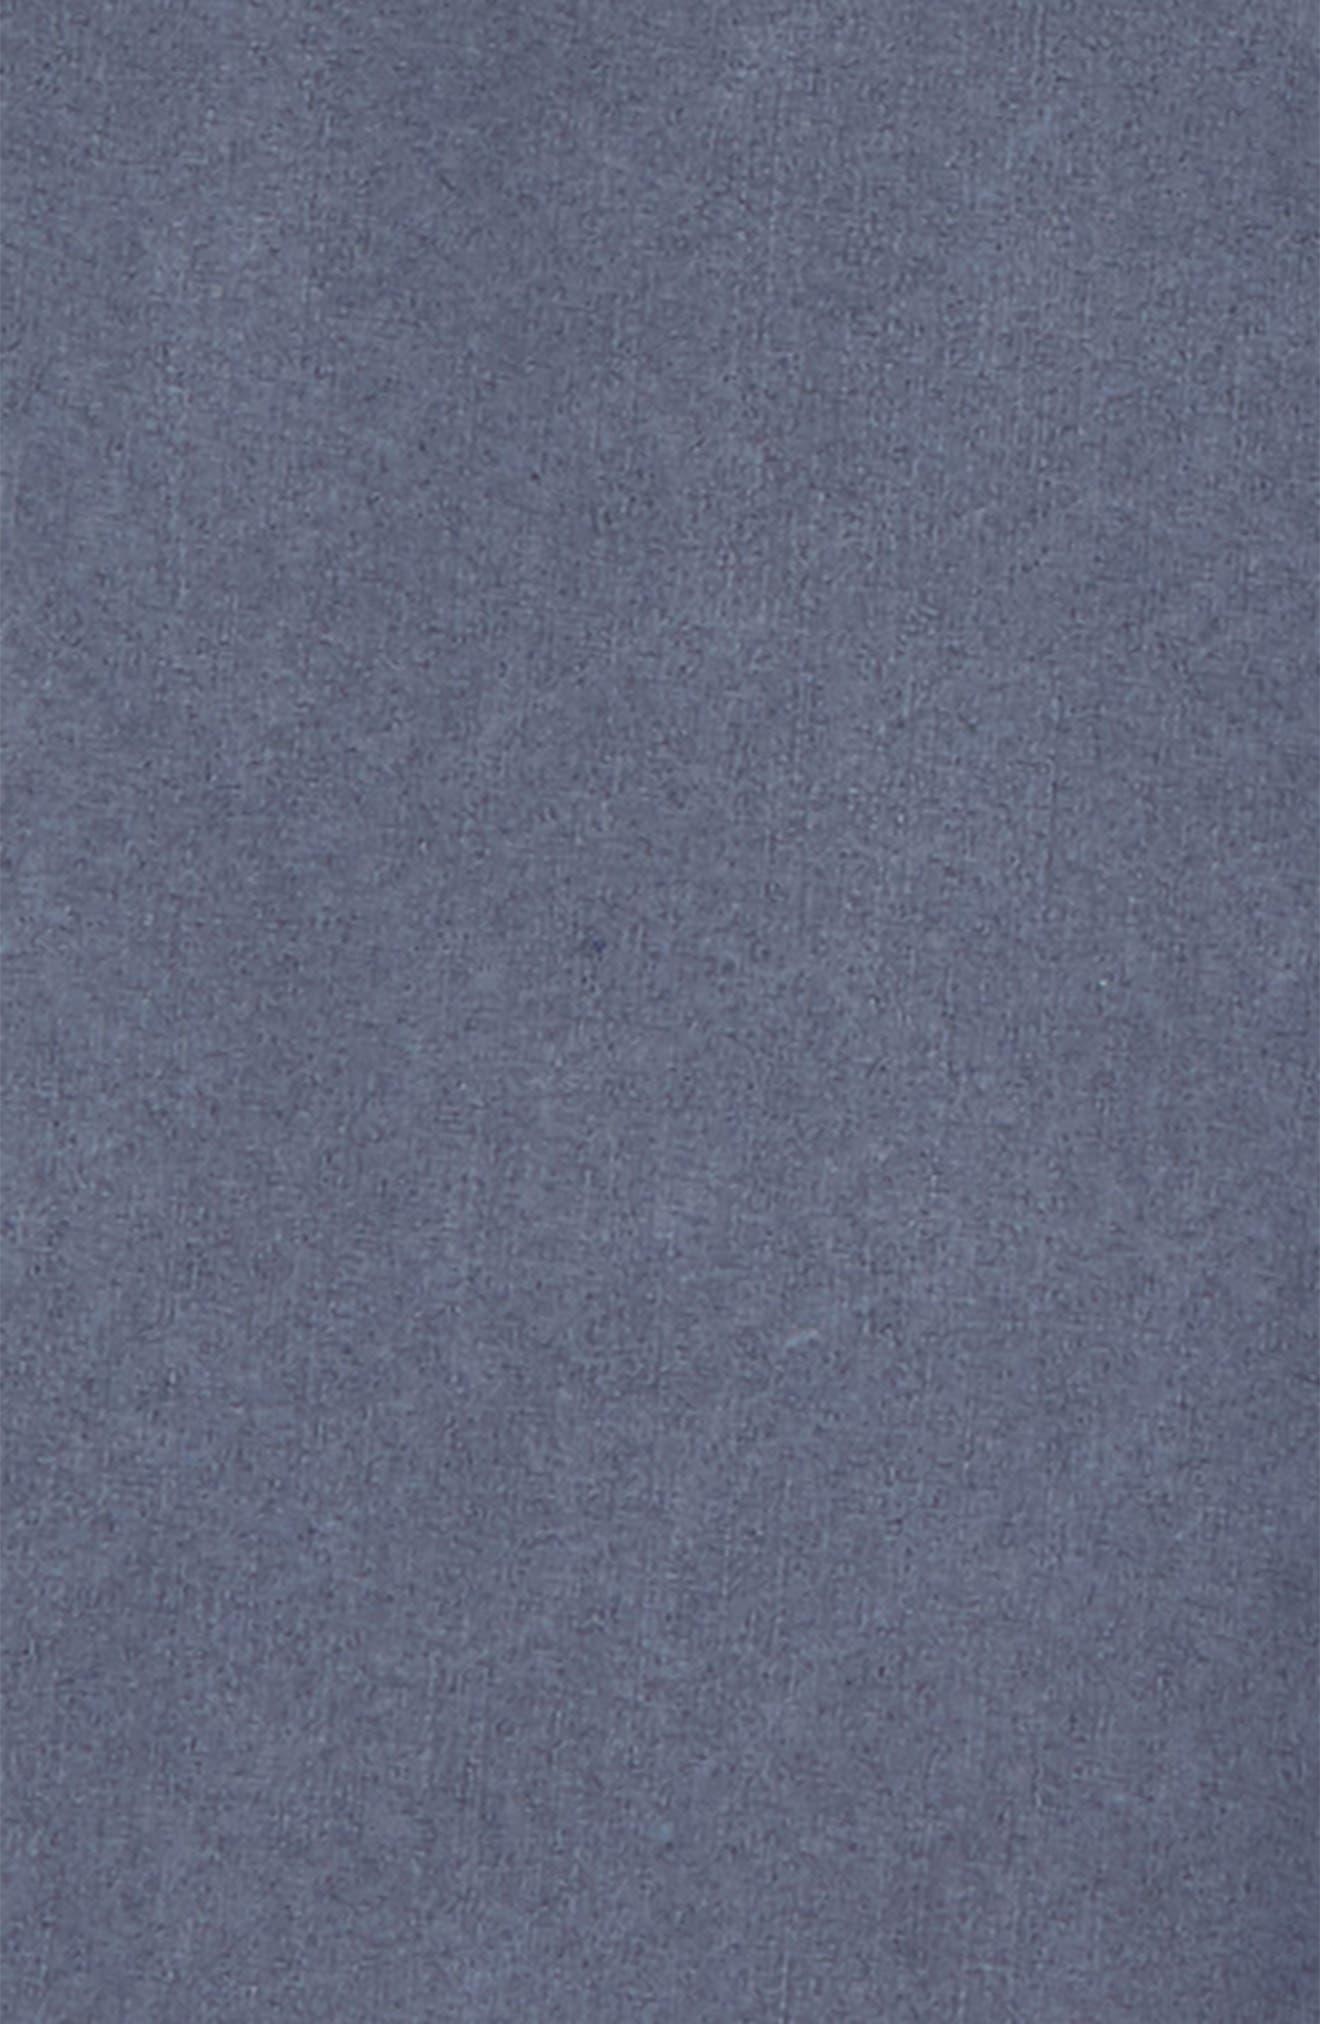 New Order X Overdye Hybrid Shorts,                             Alternate thumbnail 2, color,                             Indigo